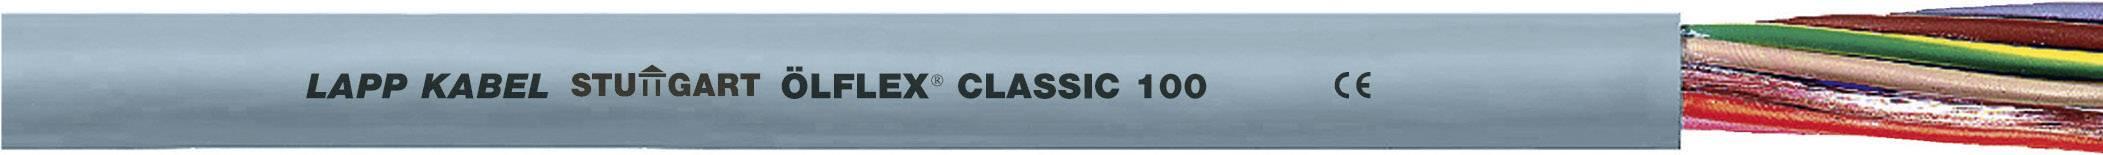 Kabel LappKabel Ölflex CLASSIC 100 4G25 (00101153), PVC, 25,4 mm, 750 V, šedá, 100 m